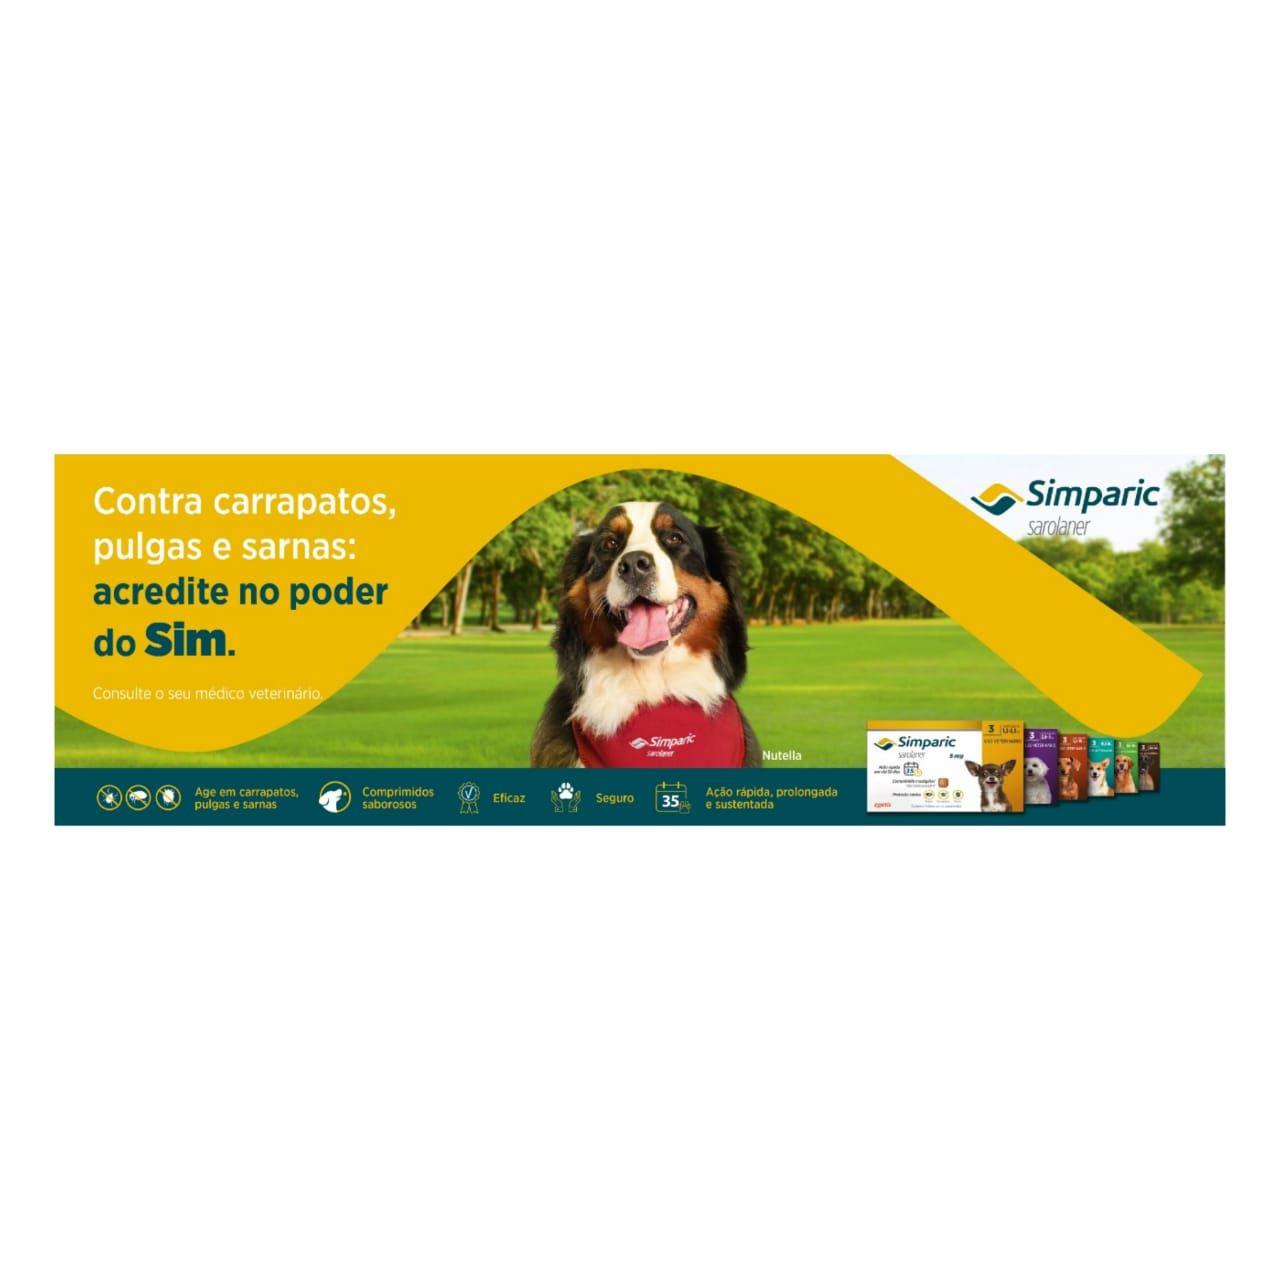 Antipulgas Zoetis Simparic 40mg para Cães 10,1 a 20 Kg - 3 Comprimidos